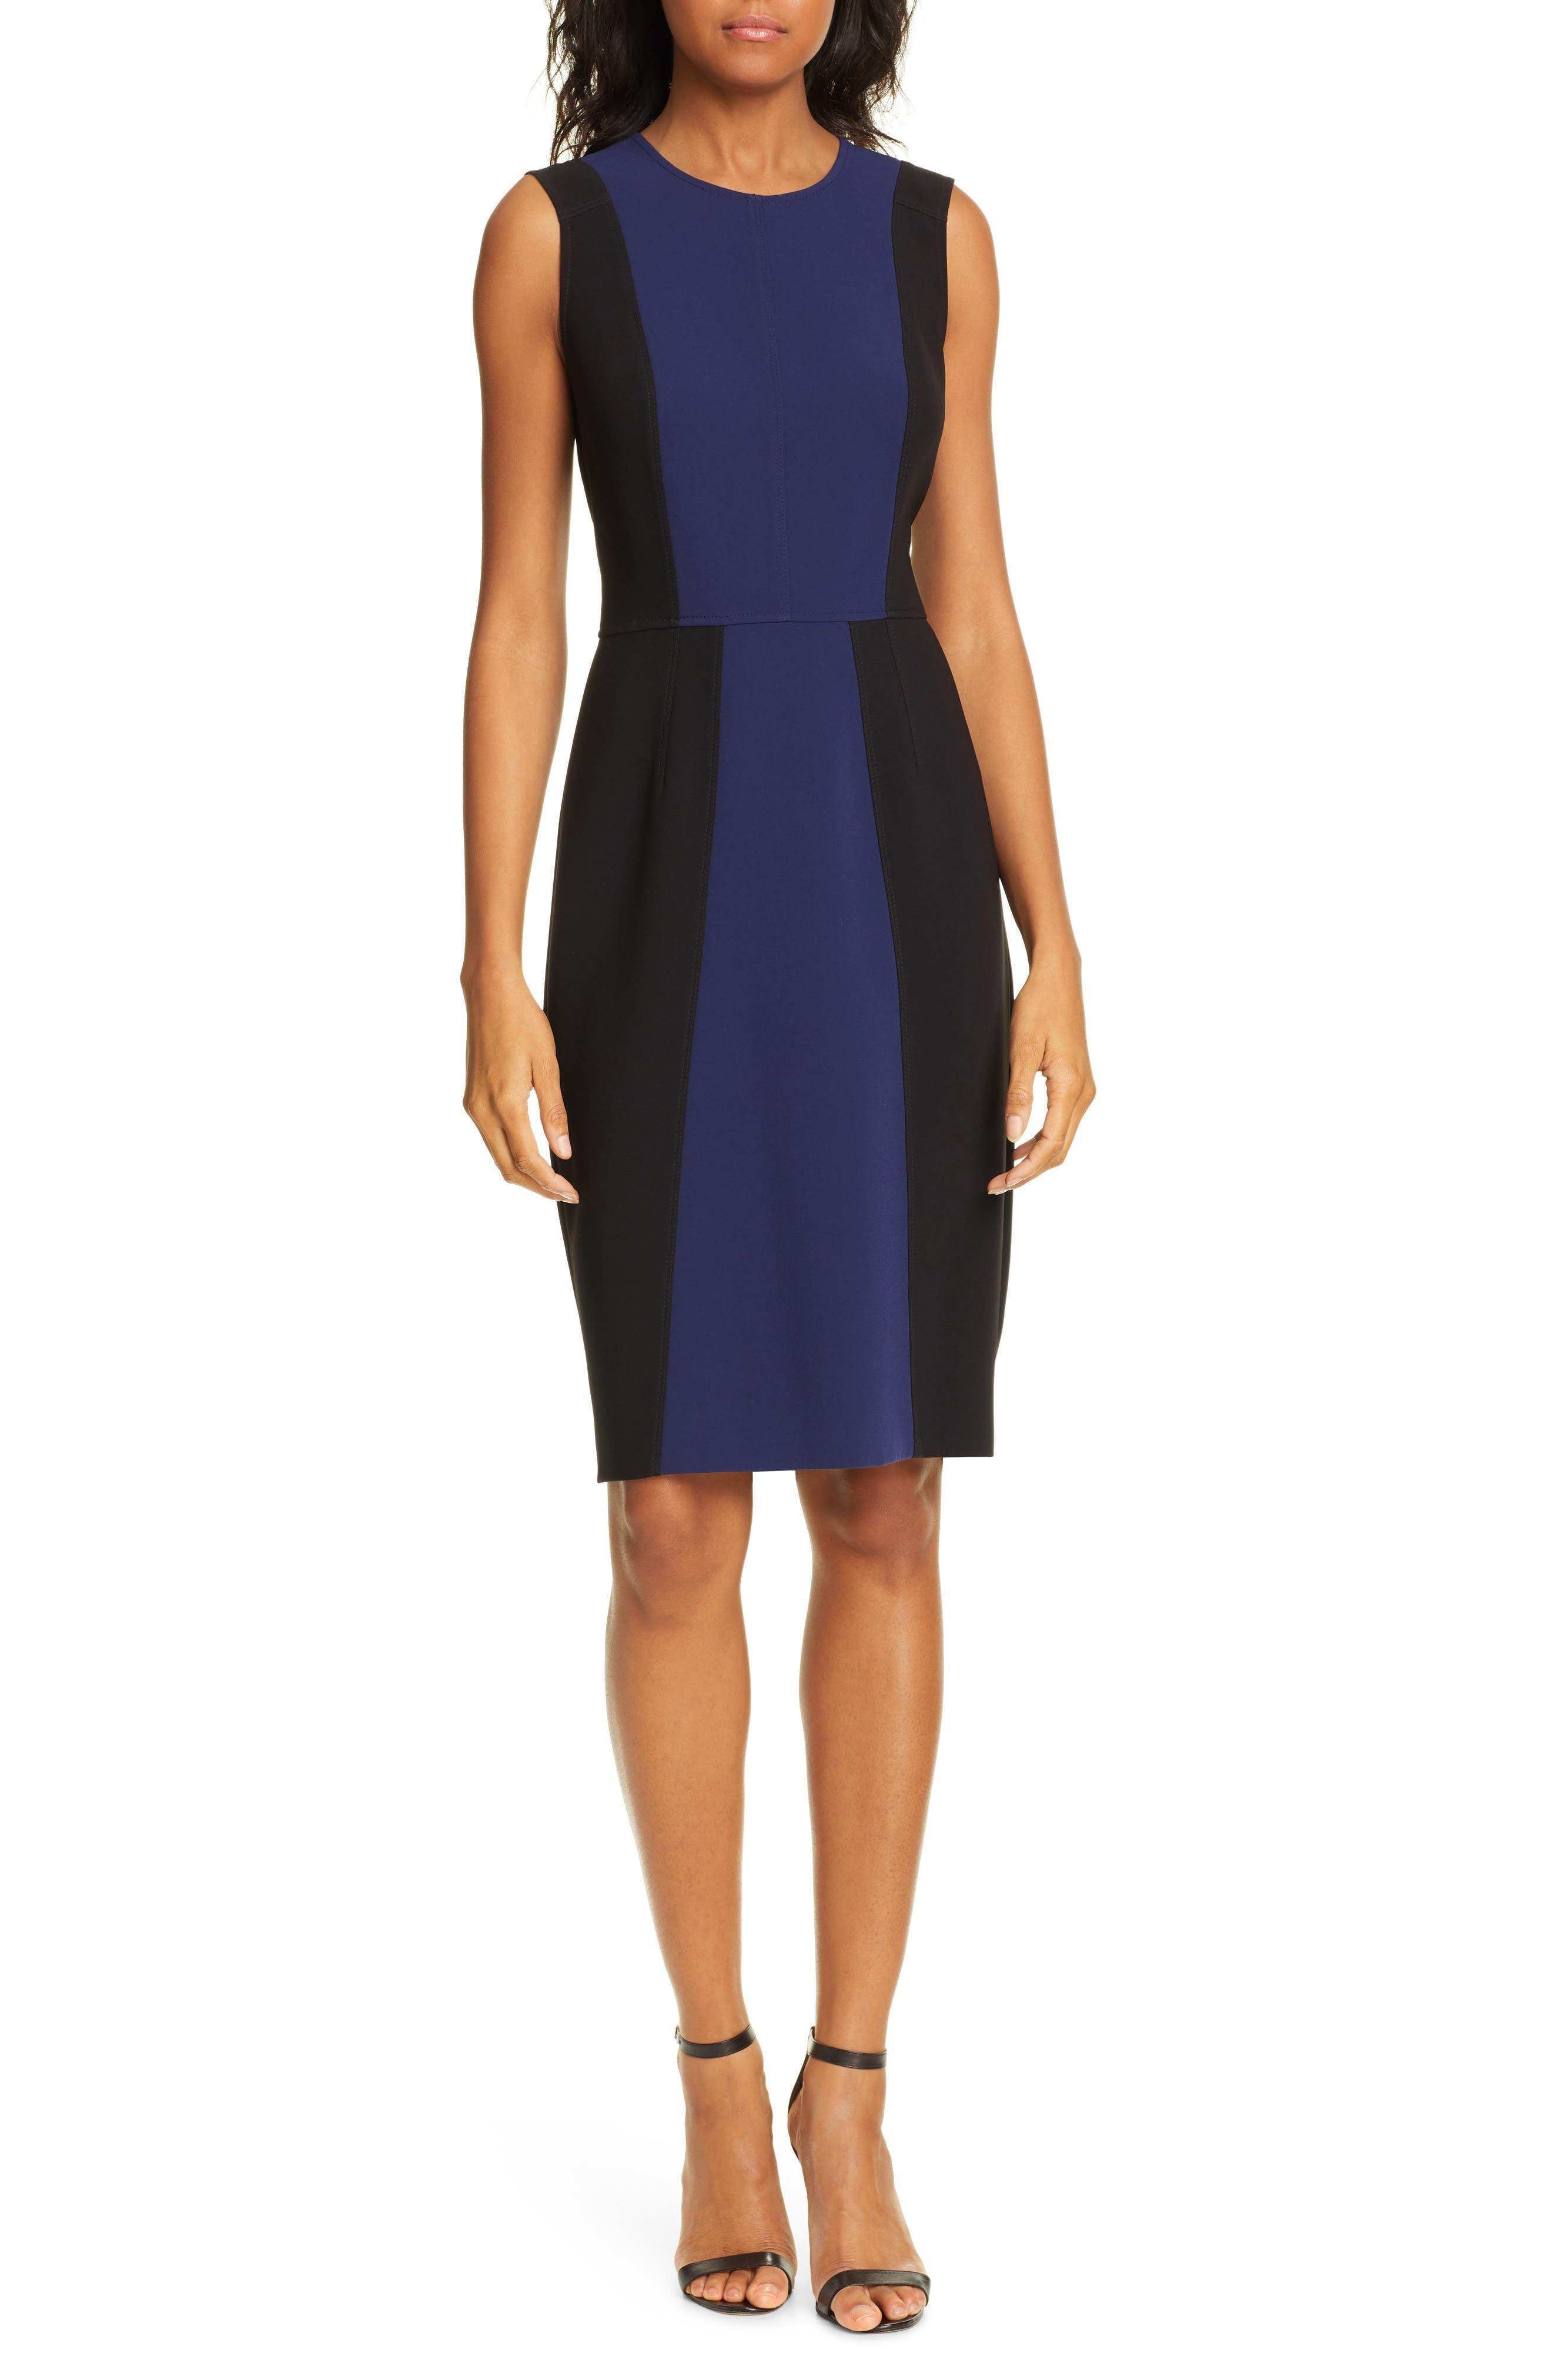 Dvf Calliope Sheath Dress, Black